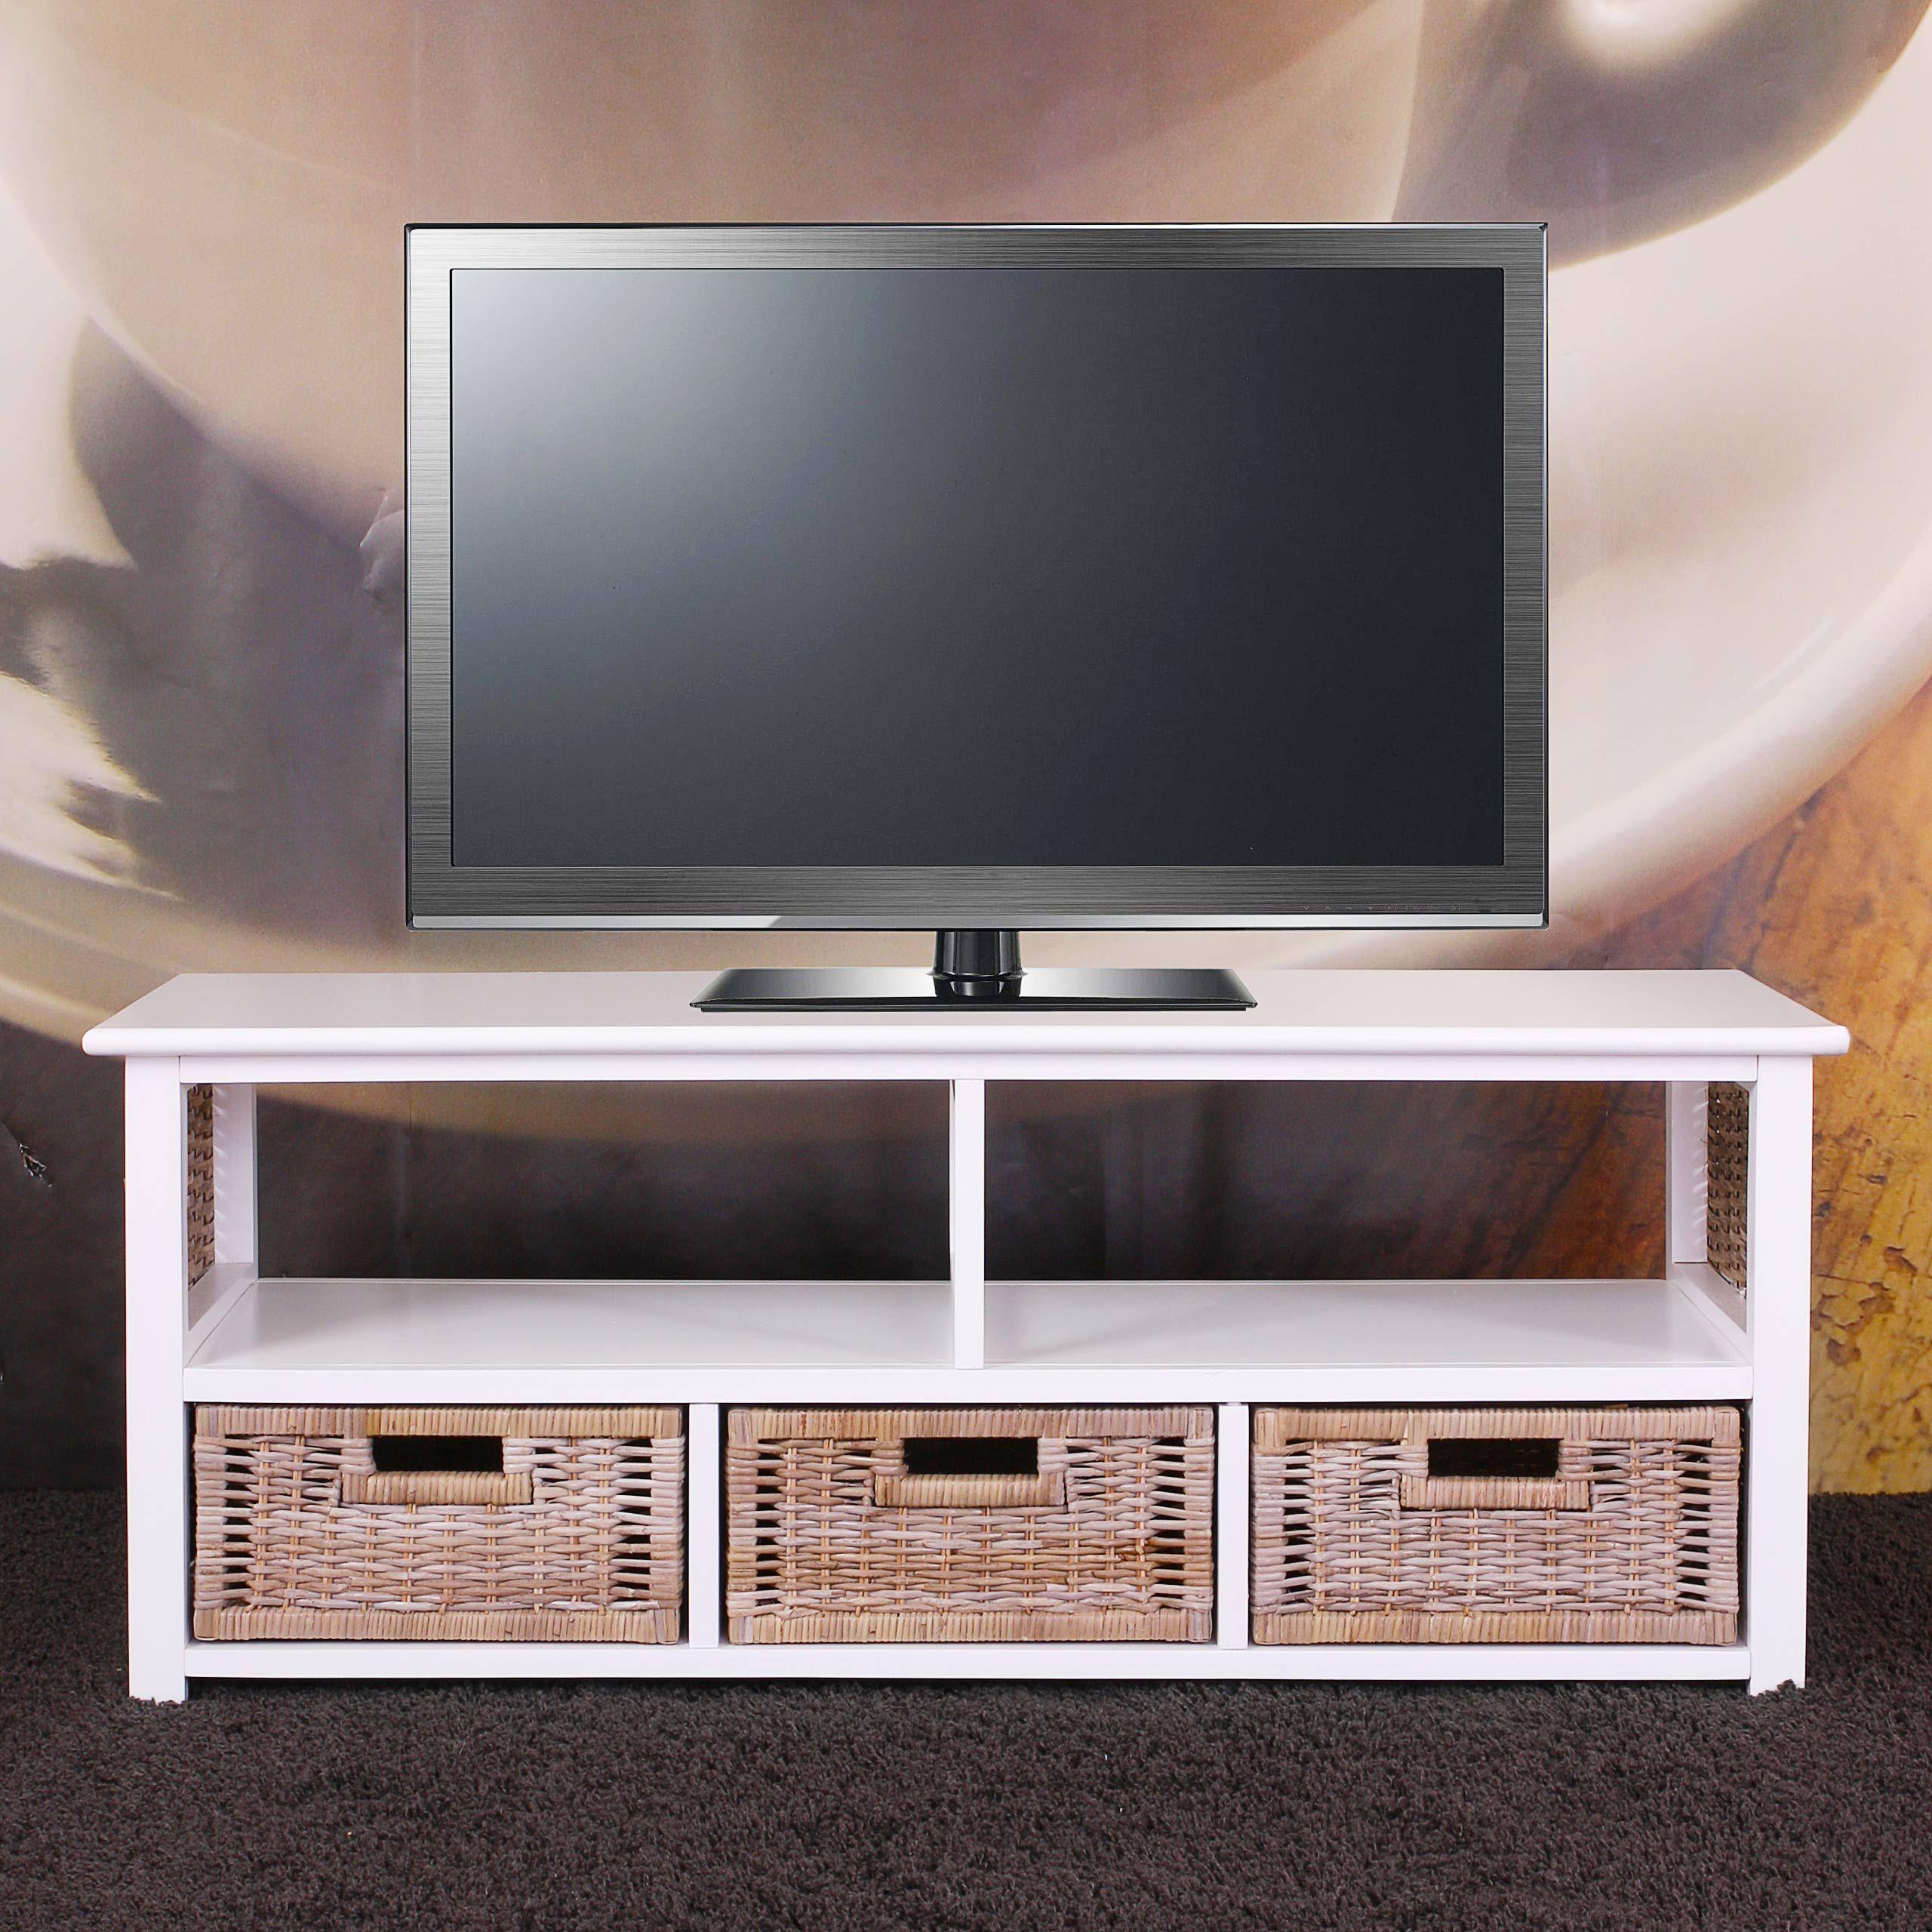 Table Basse Et Table De Television - Meuble Table Basse T L Bois Massif Osier 3 Tiroirs Meubles D [mjhdah]https://www.heure-creation.fr/wp-content/uploads/2016/05/table-basse-style-industriel-tiroirs-roulettes.jpg